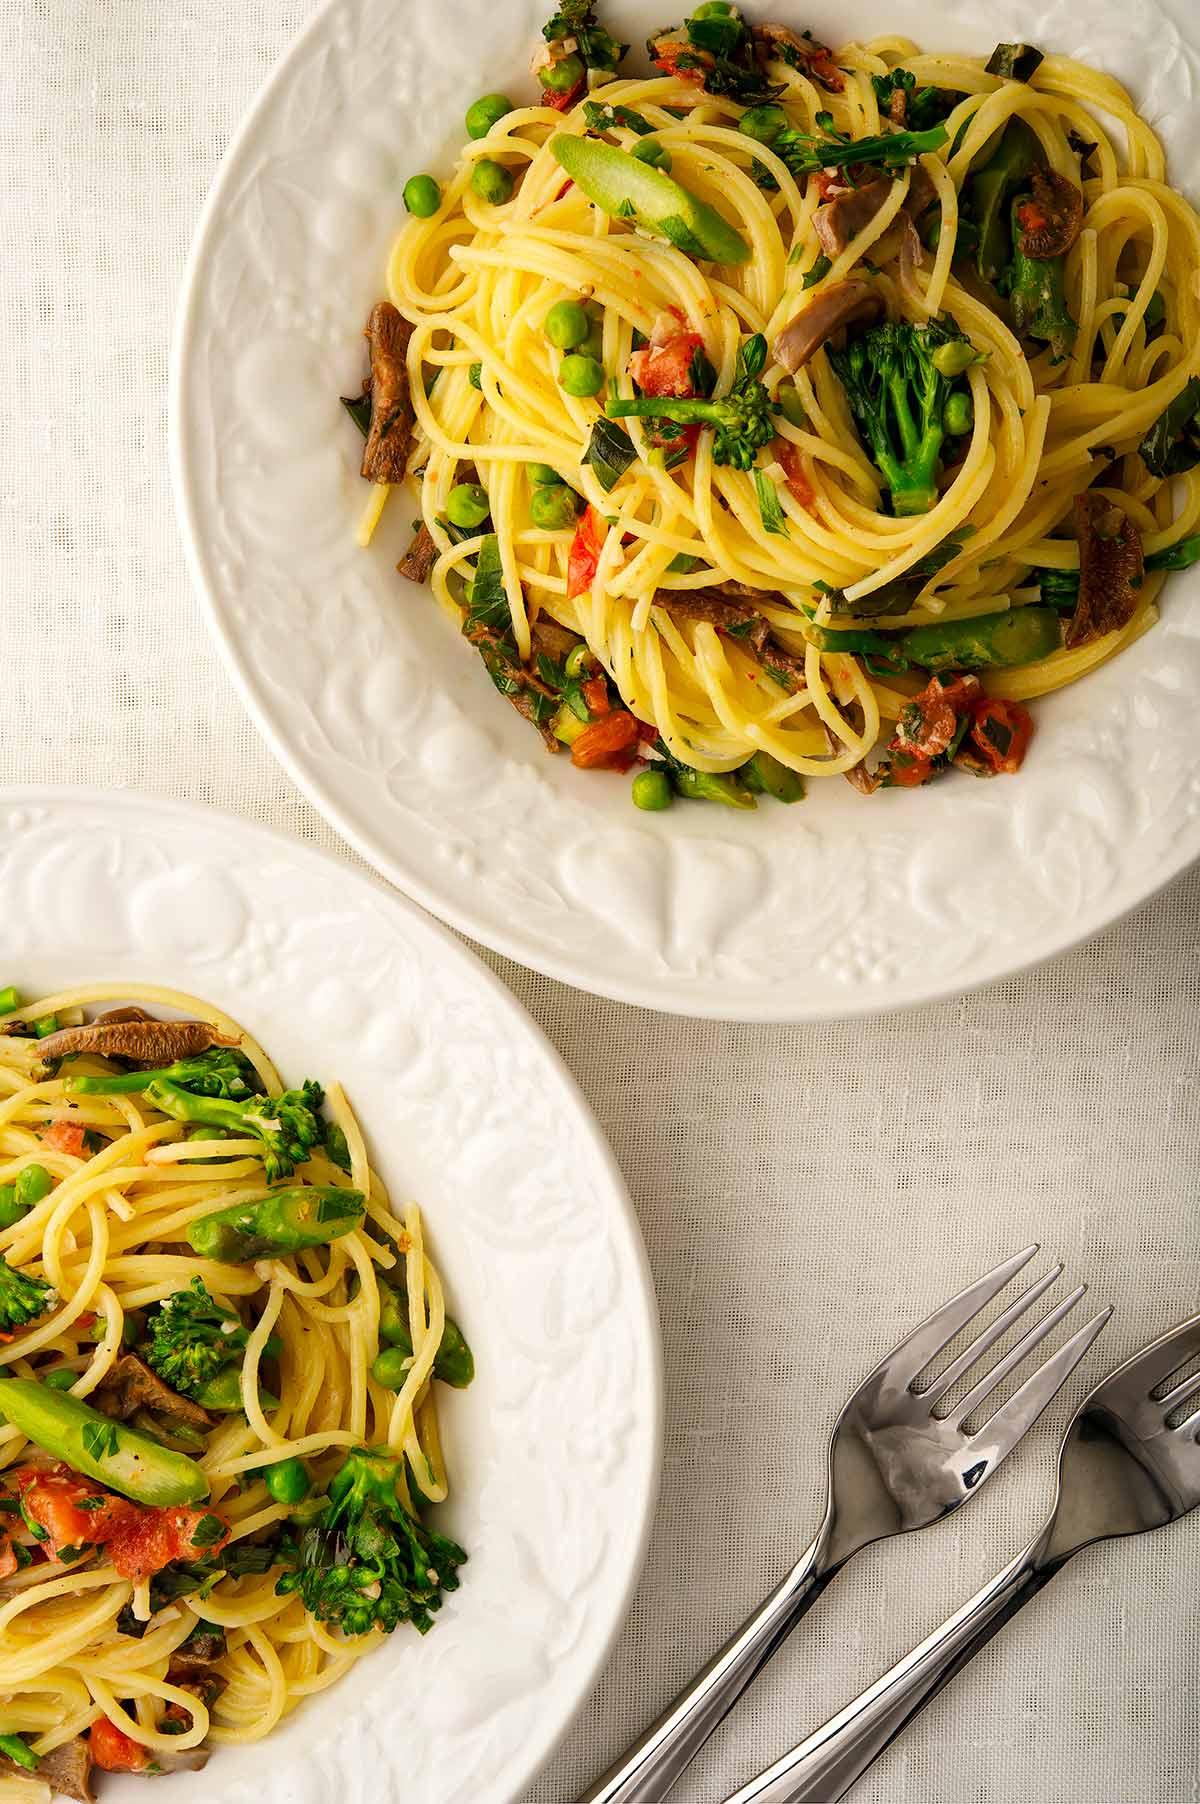 Two bowls of pasta primavera